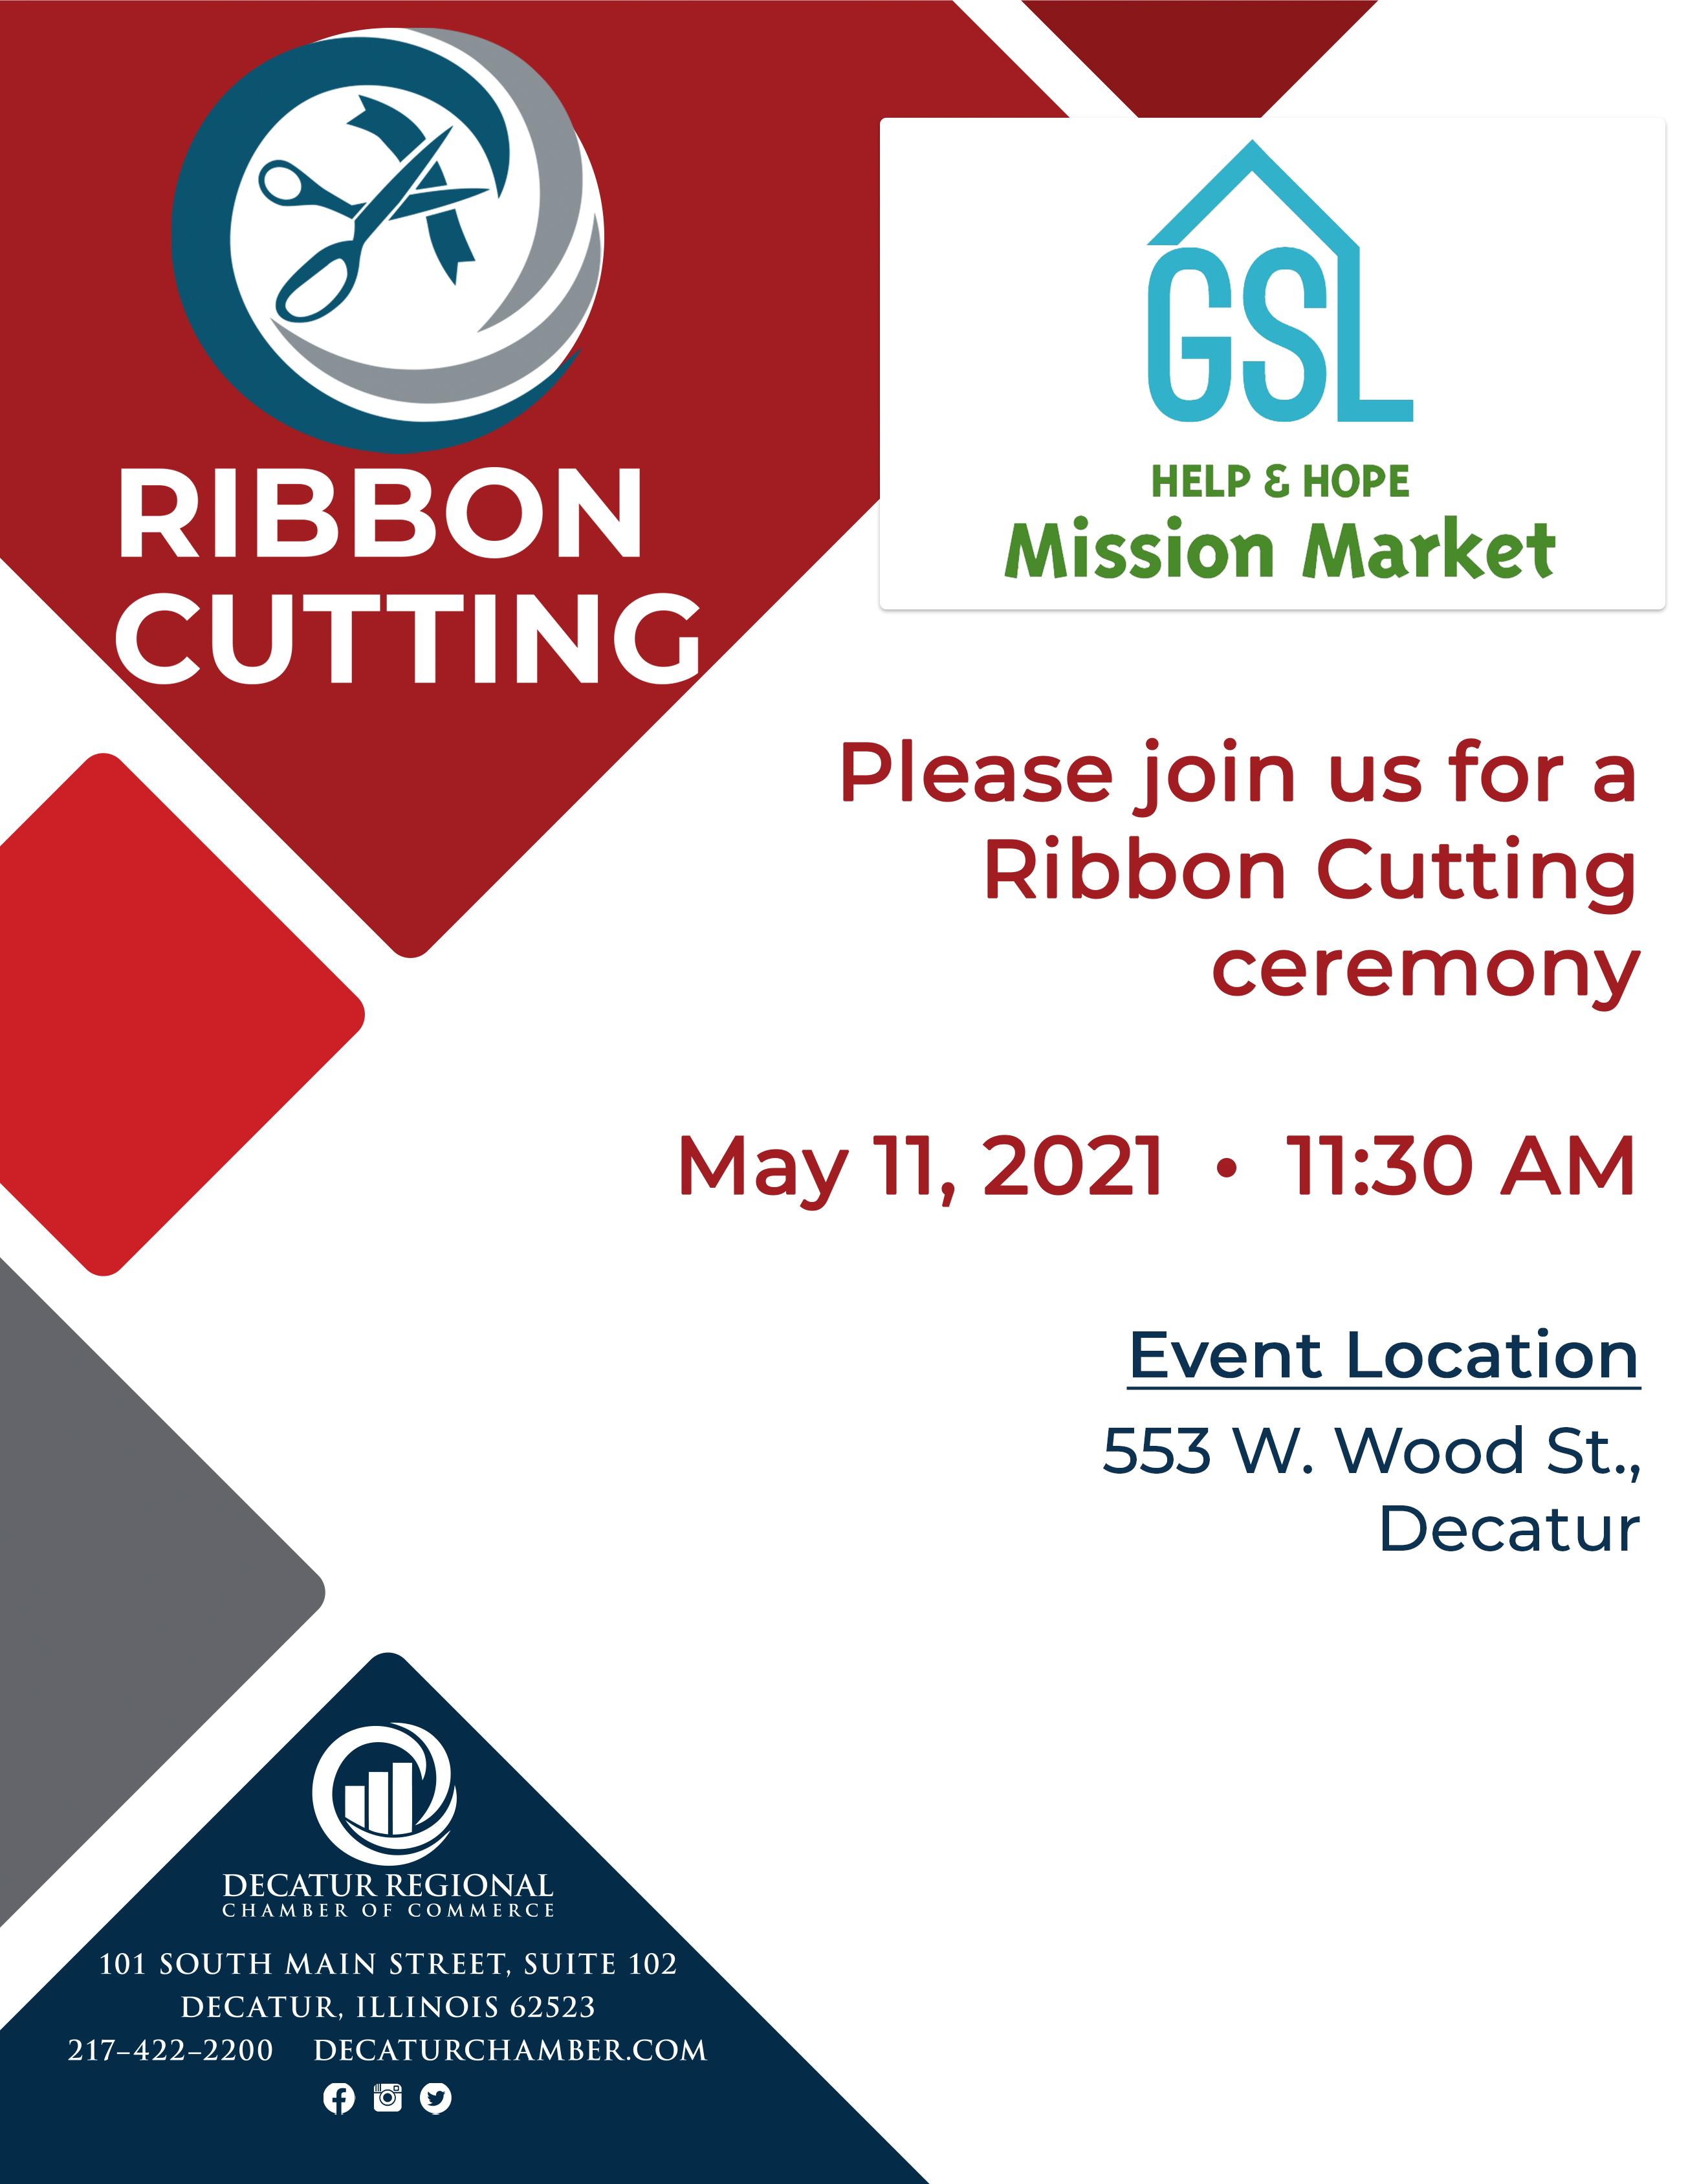 DRCC_Event Ribbon Cutting-GSL DMH_no description